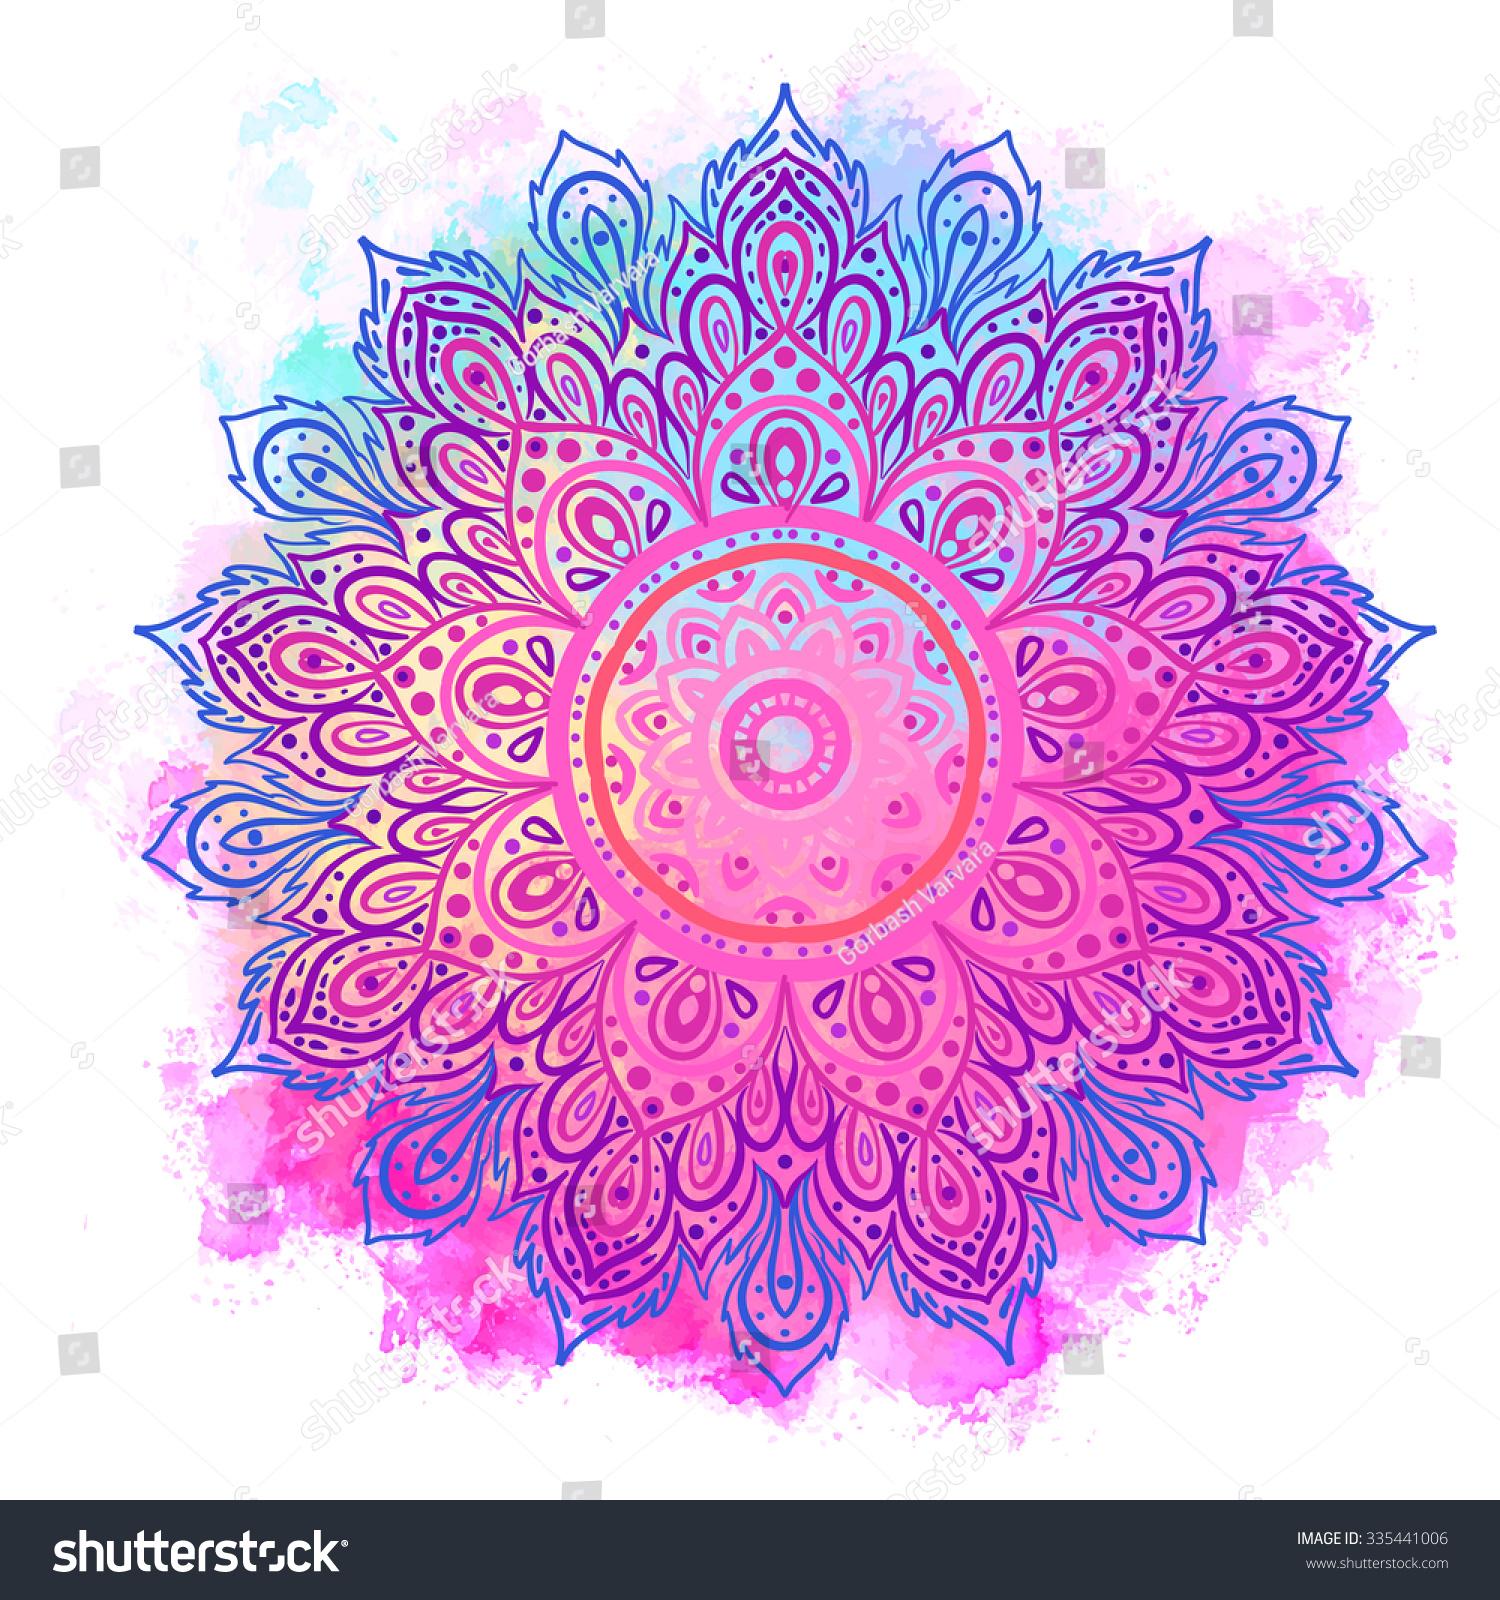 Mandala Over Colorful Watercolor Beautiful Vintage Vectores En Stock 335441006 - Shutterstock